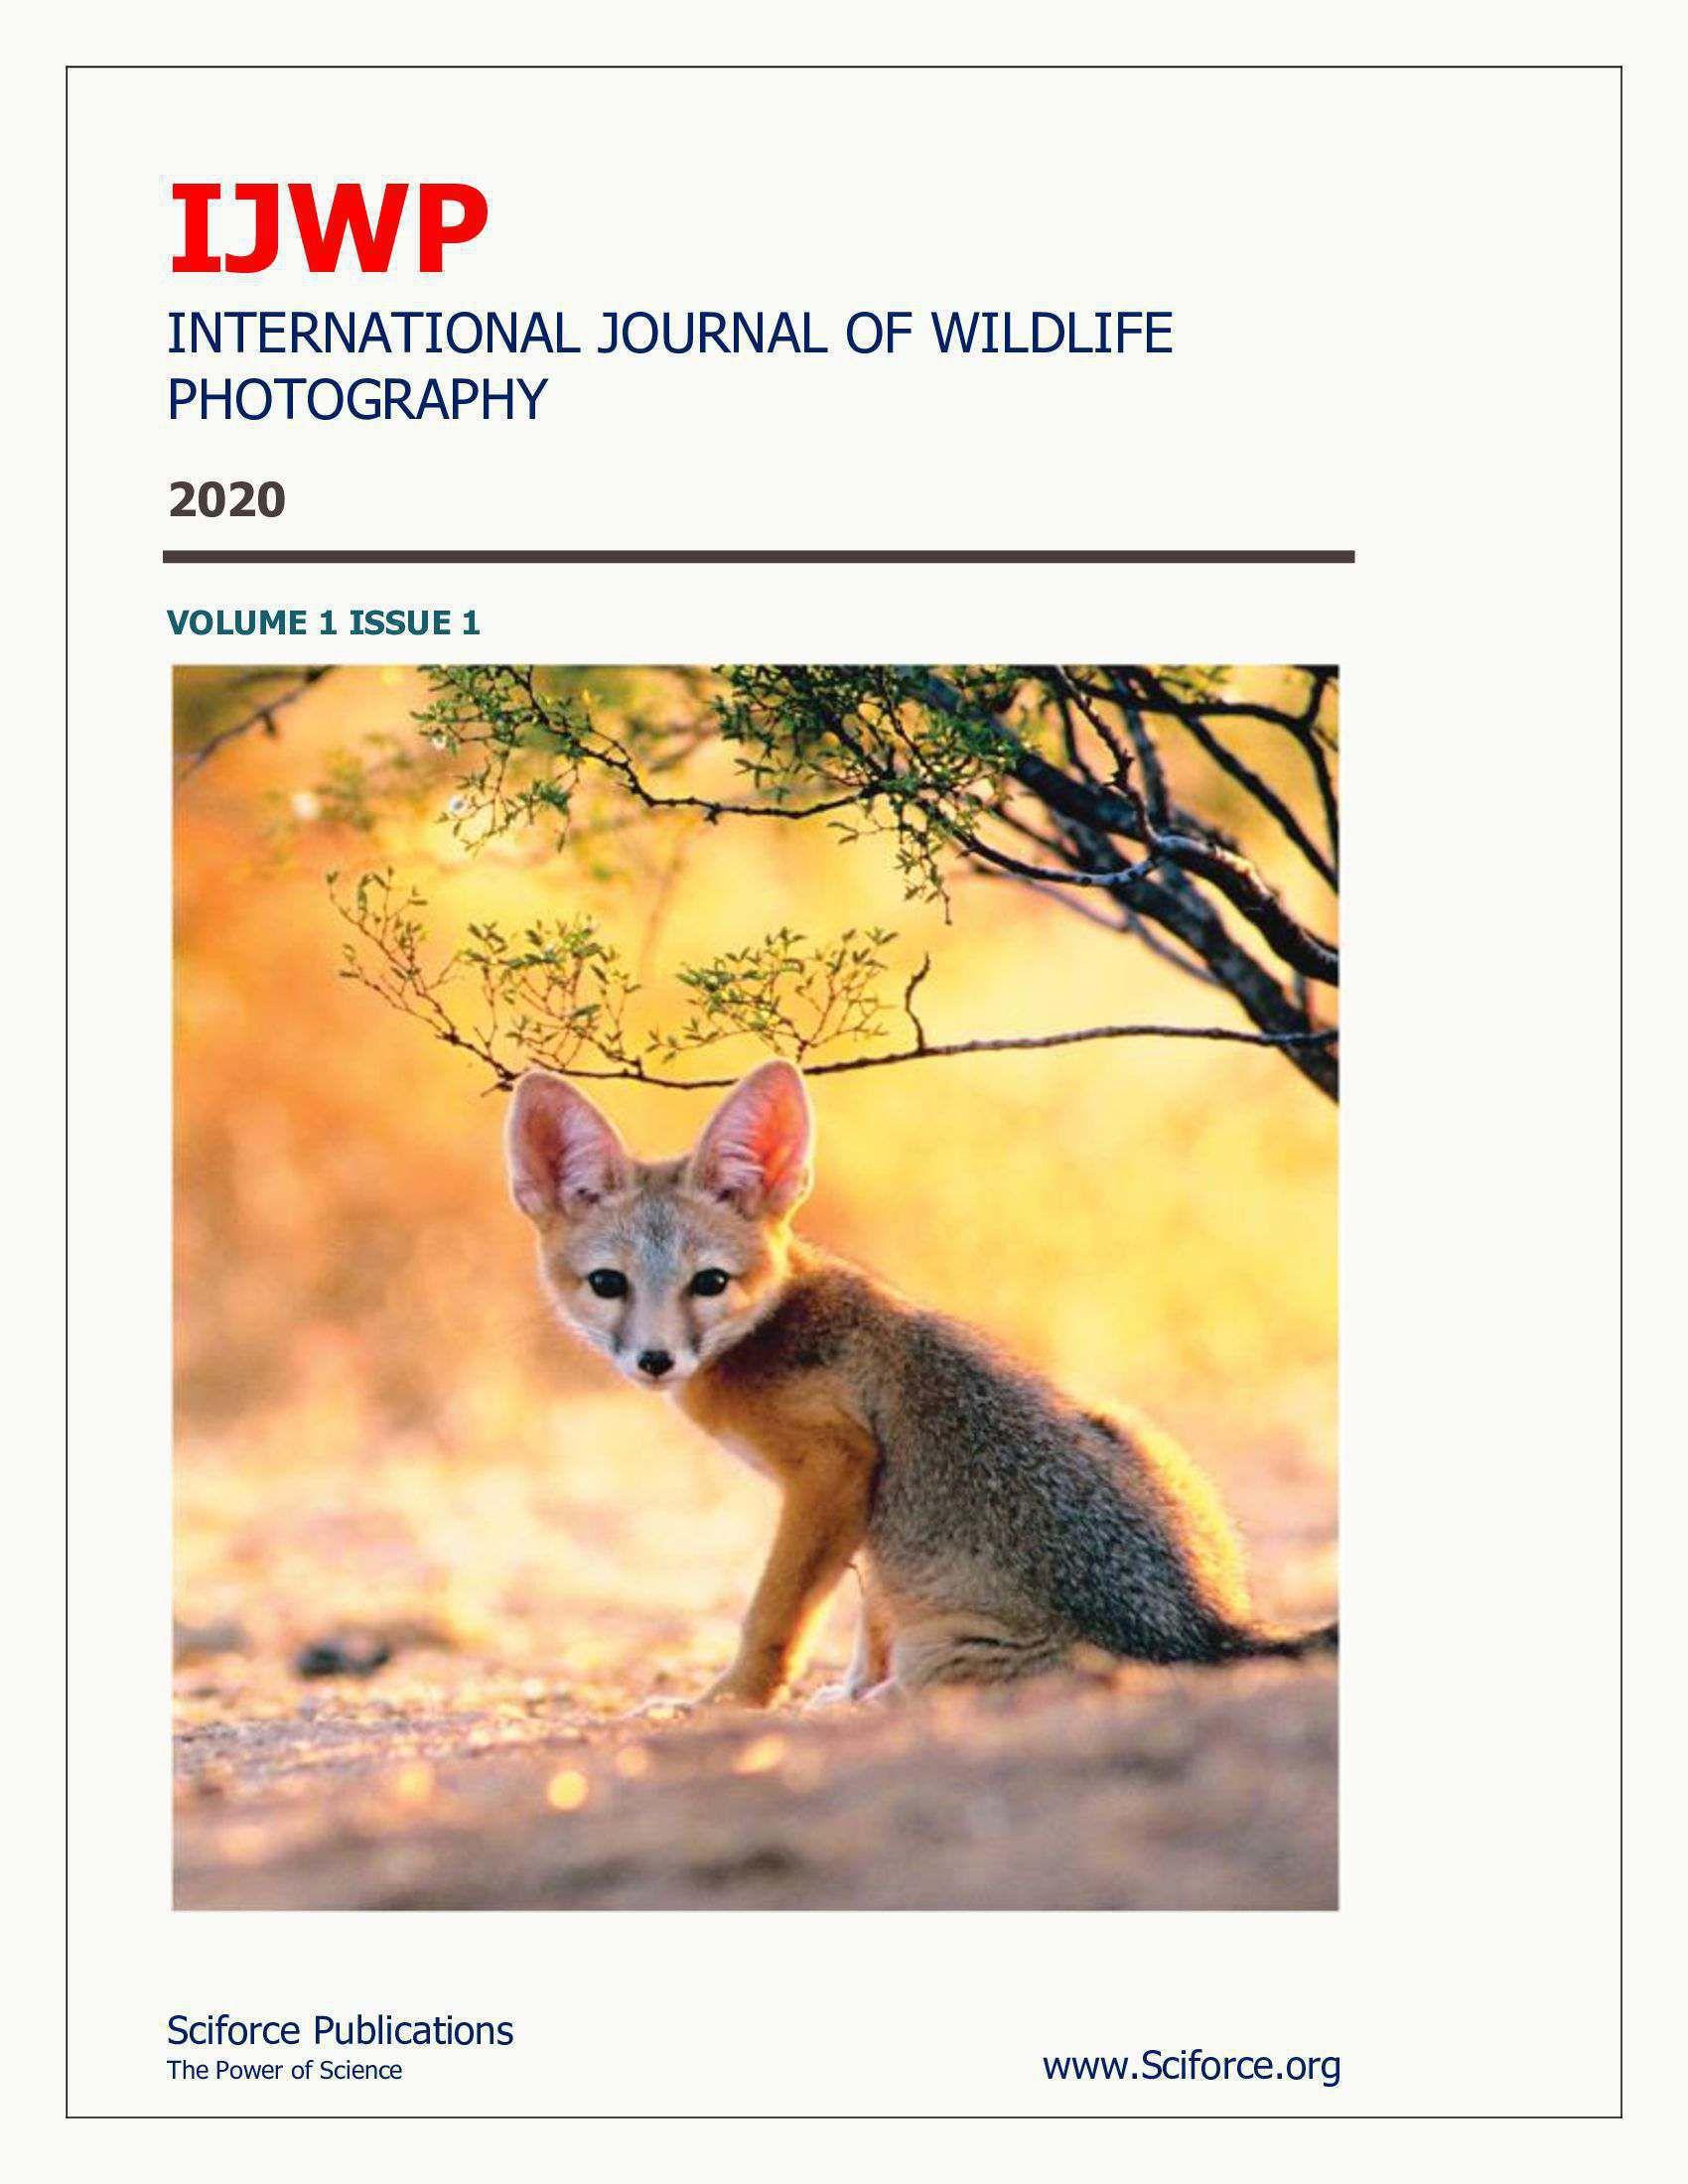 International Journal of Wildlife Photography